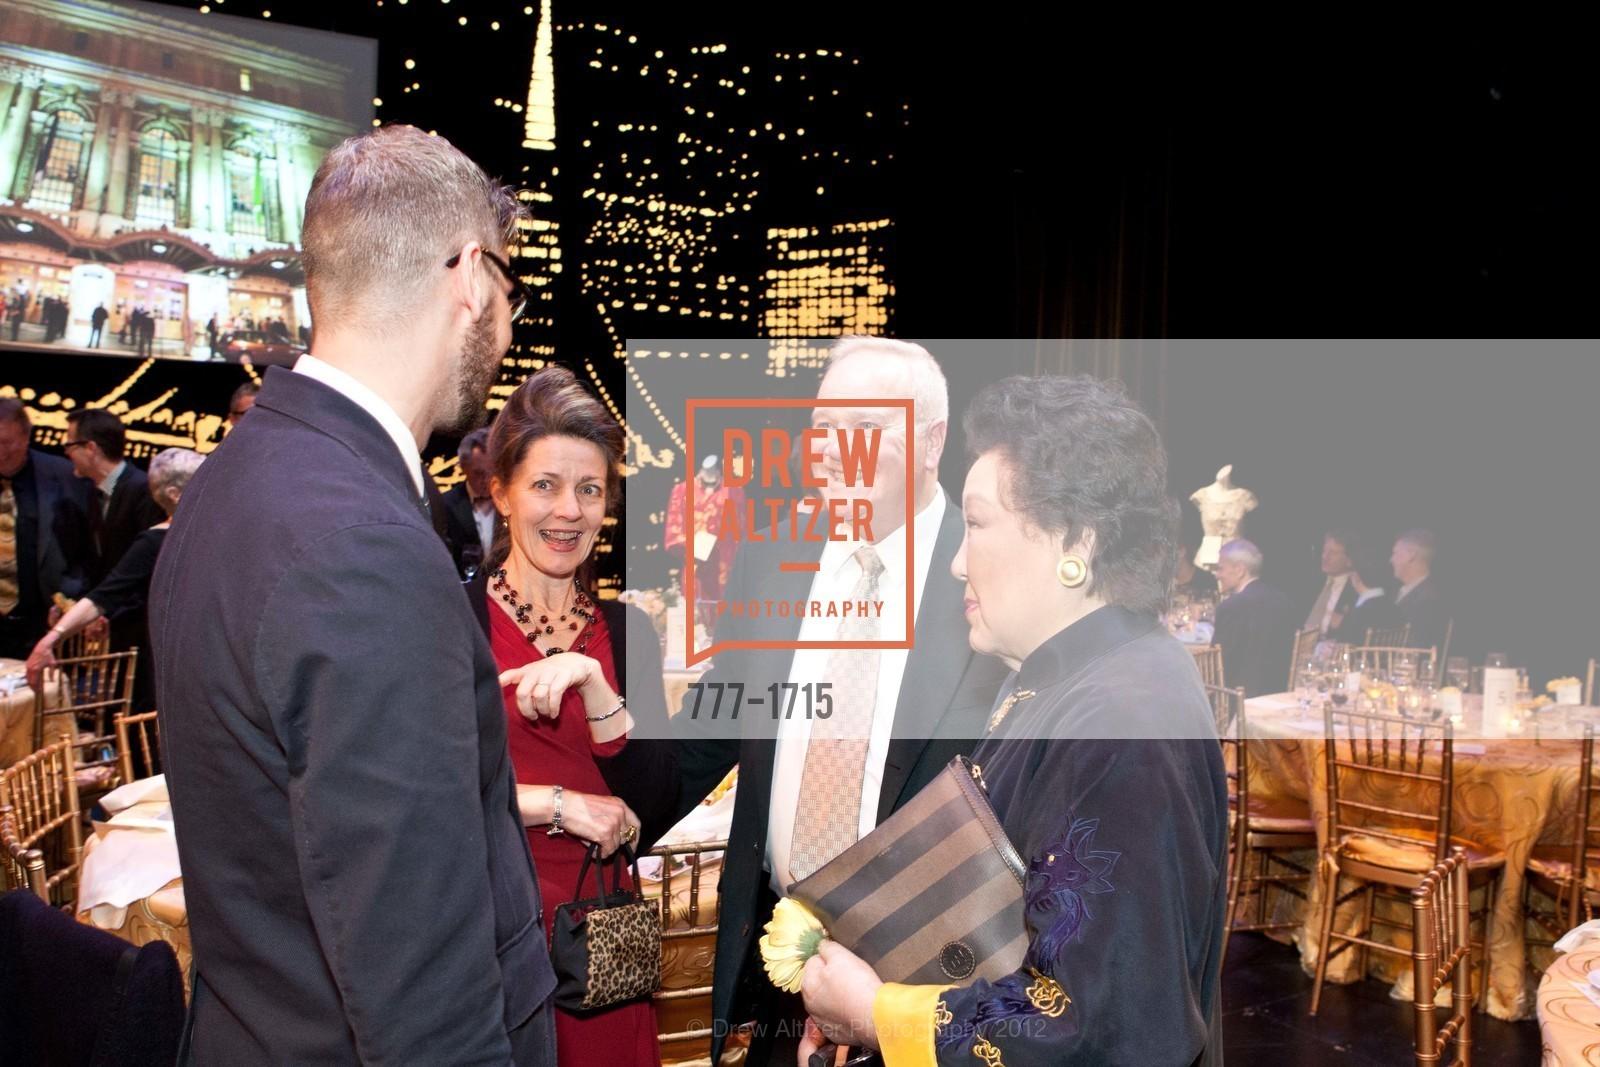 Don-Scott Cooper, Melissa Smith, James Haire, Sue Yung Li, Photo #777-1715